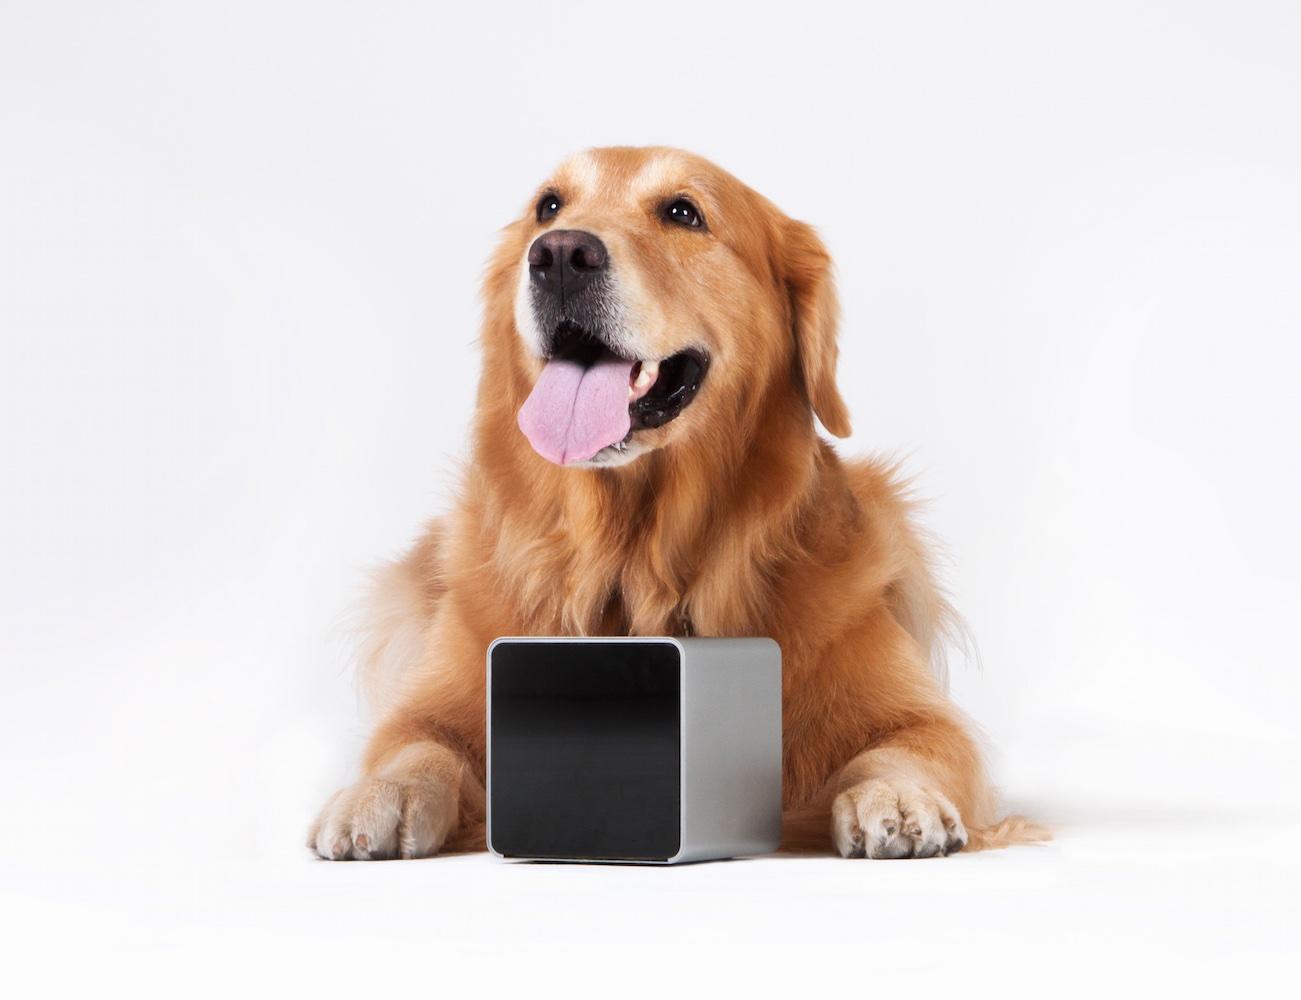 petcube-remote-wireless-pet-camera-03.jpg